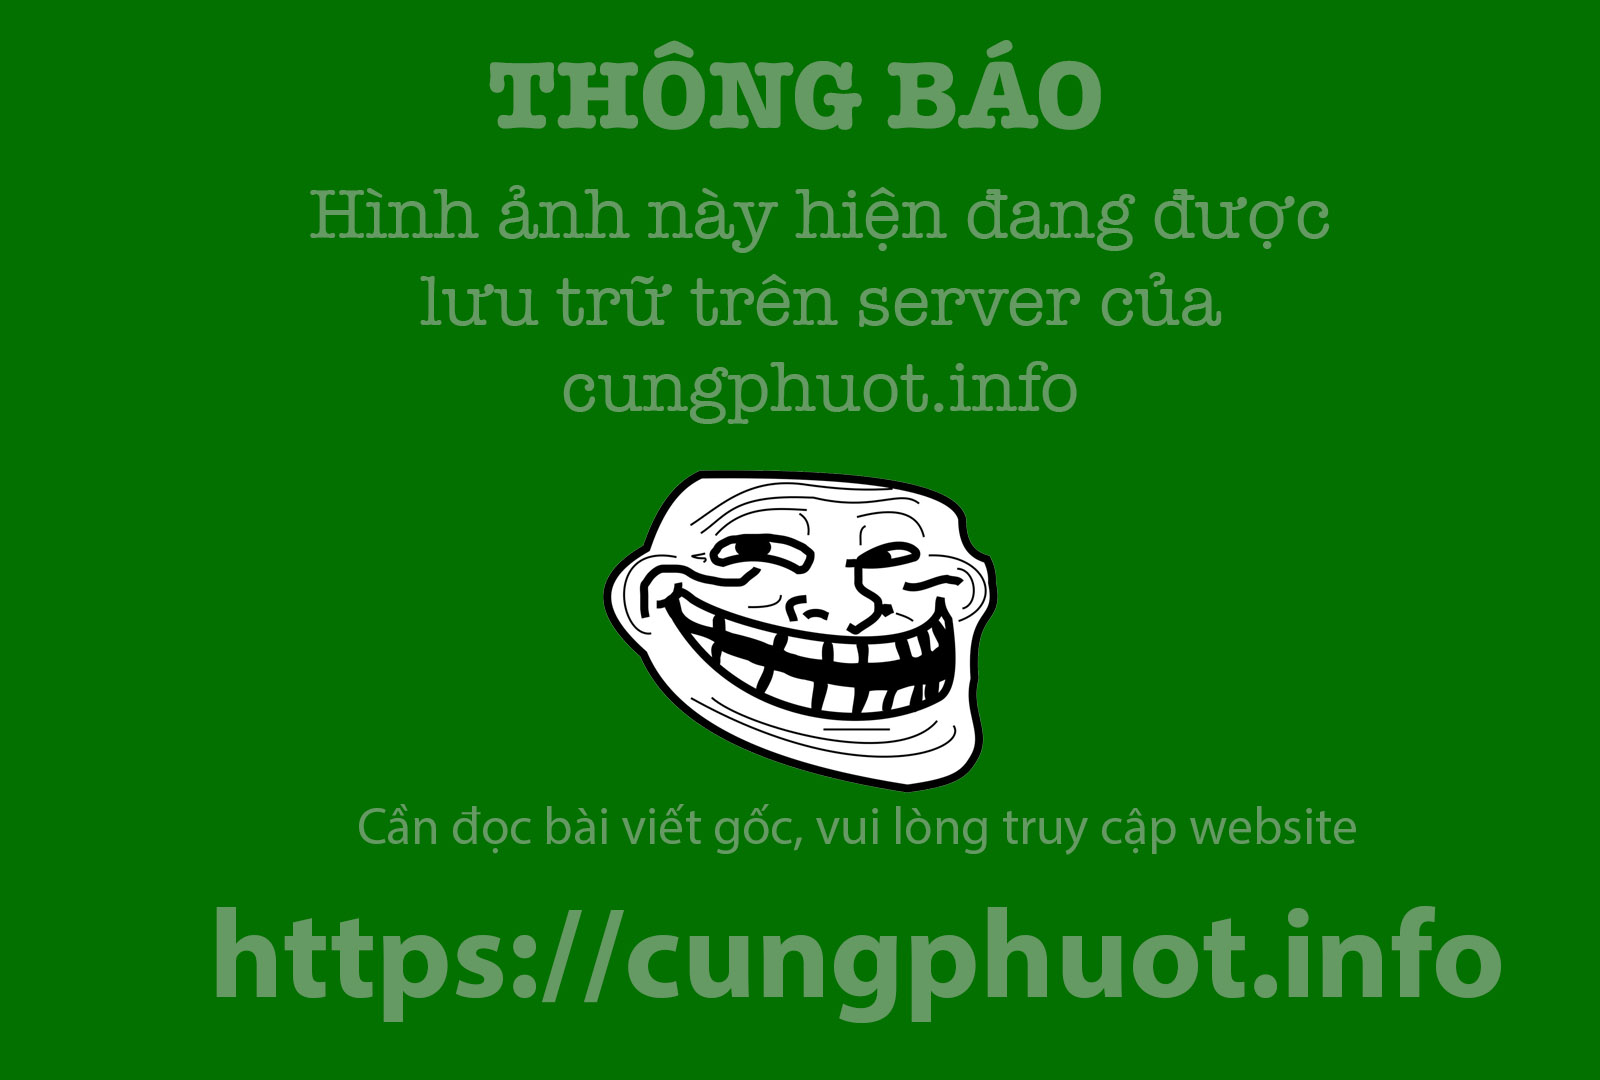 vietjet-dong-bac-a